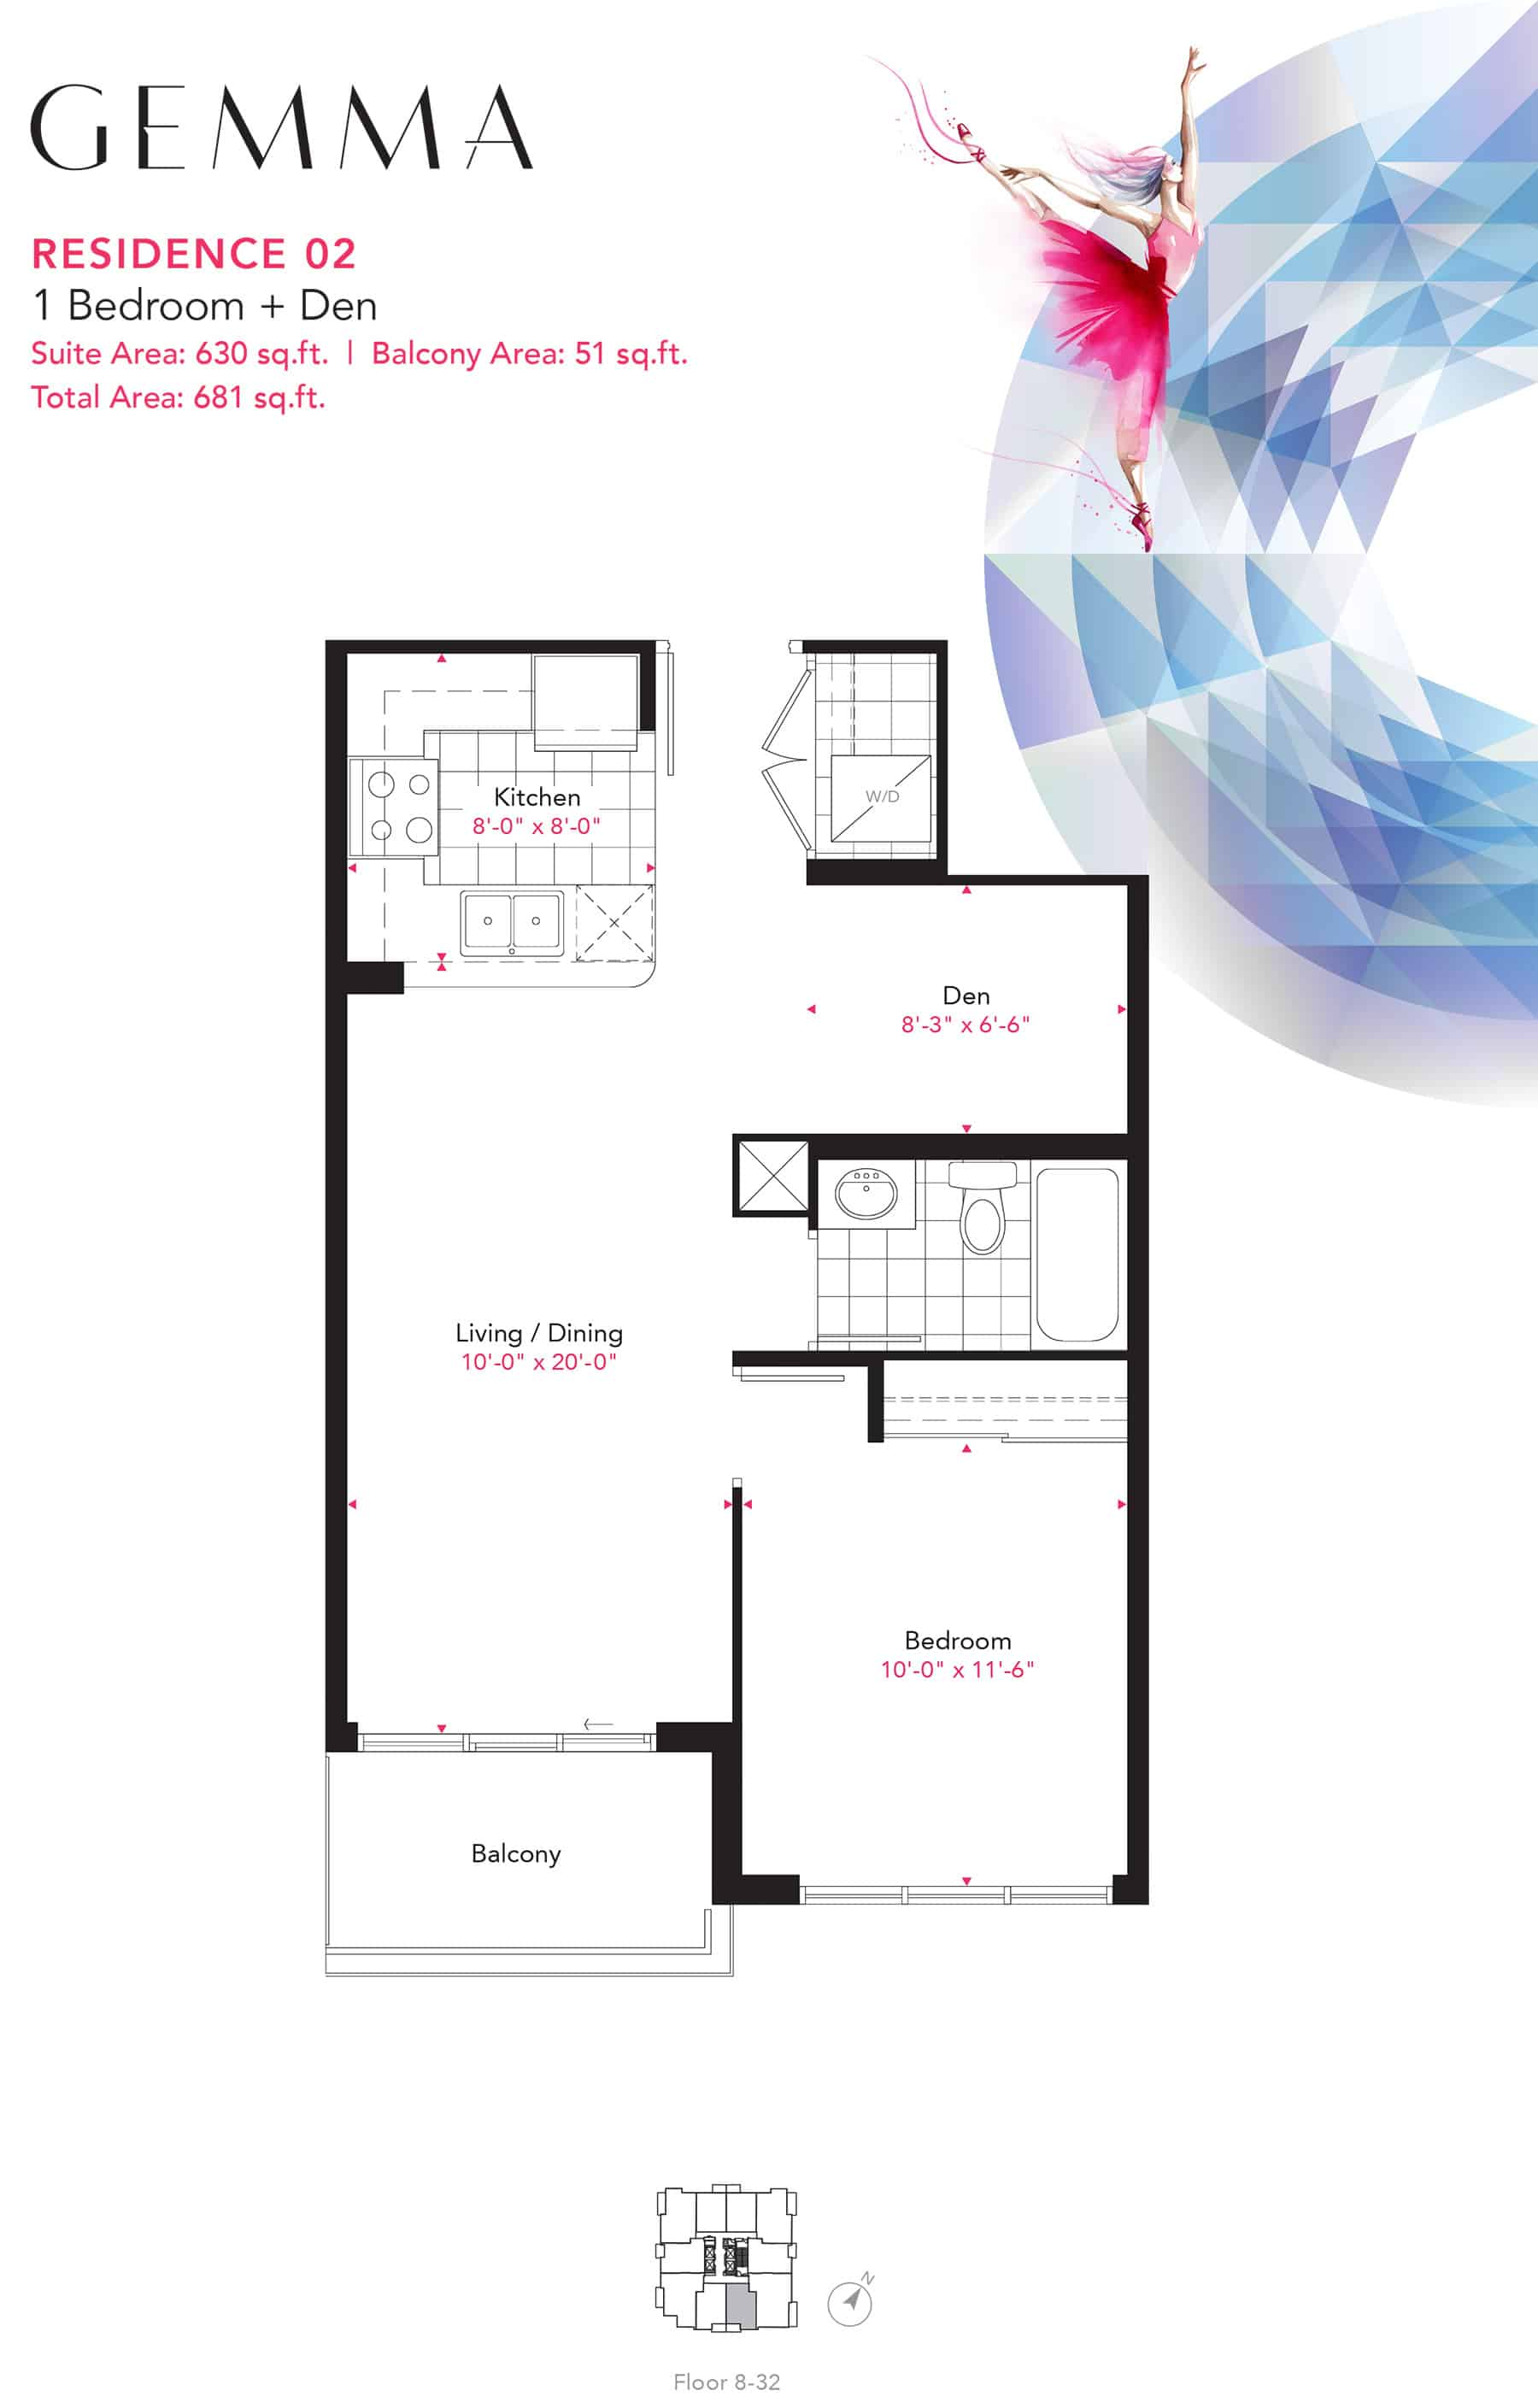 Residence-02-1B+D-630-Sqft-Gemma  Gemma Condos Residence 02 1BD 630 Sqft Gemma